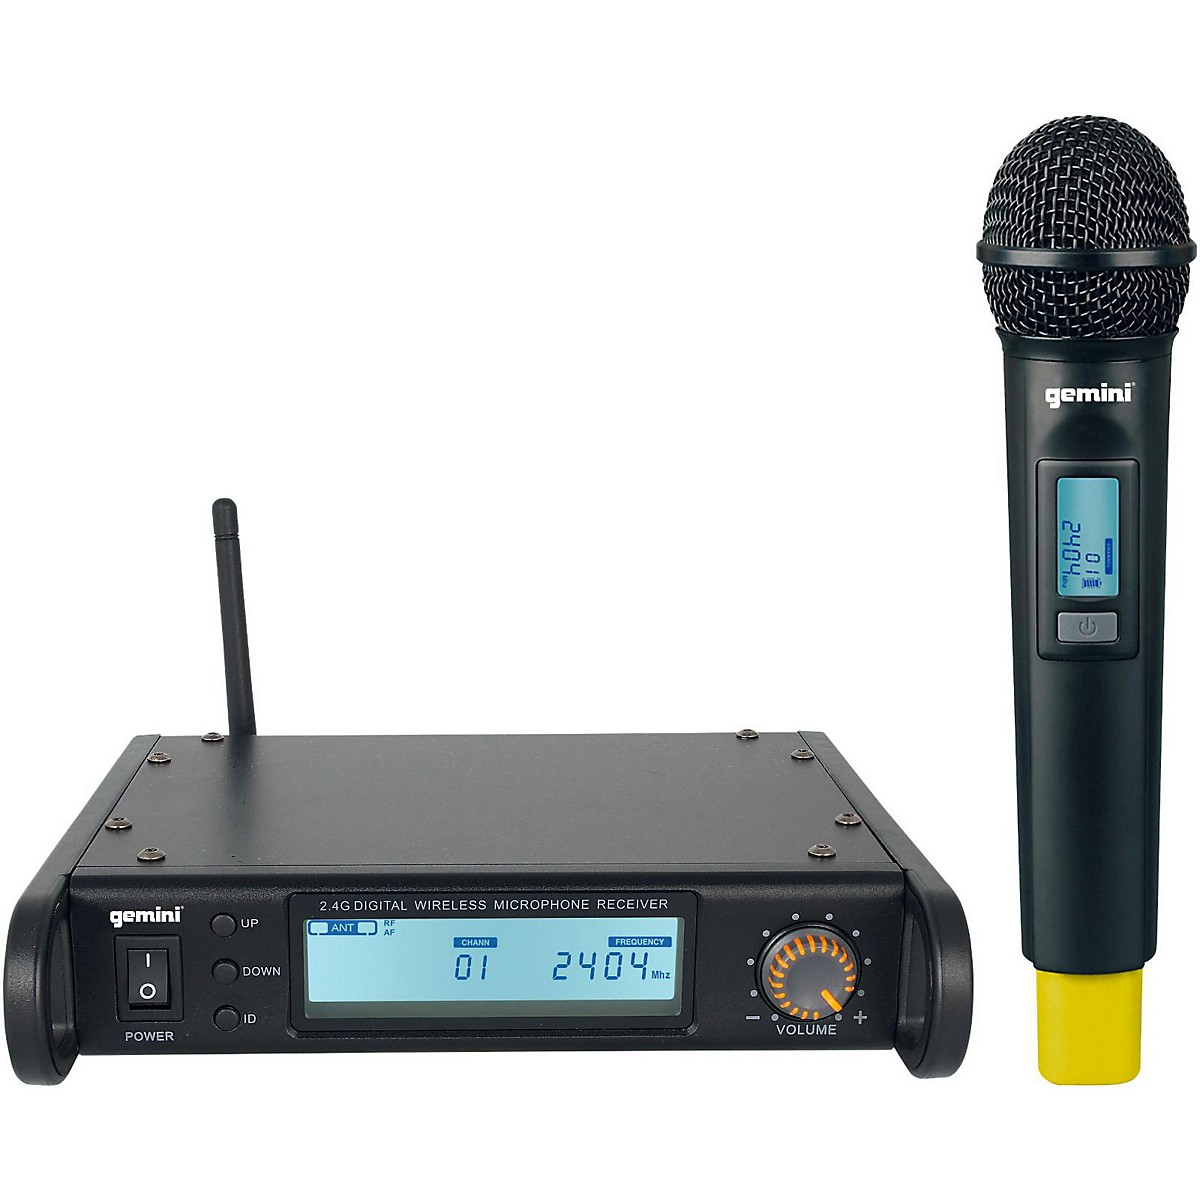 Gemini GDX-1000M Digital Wireless Microphone system